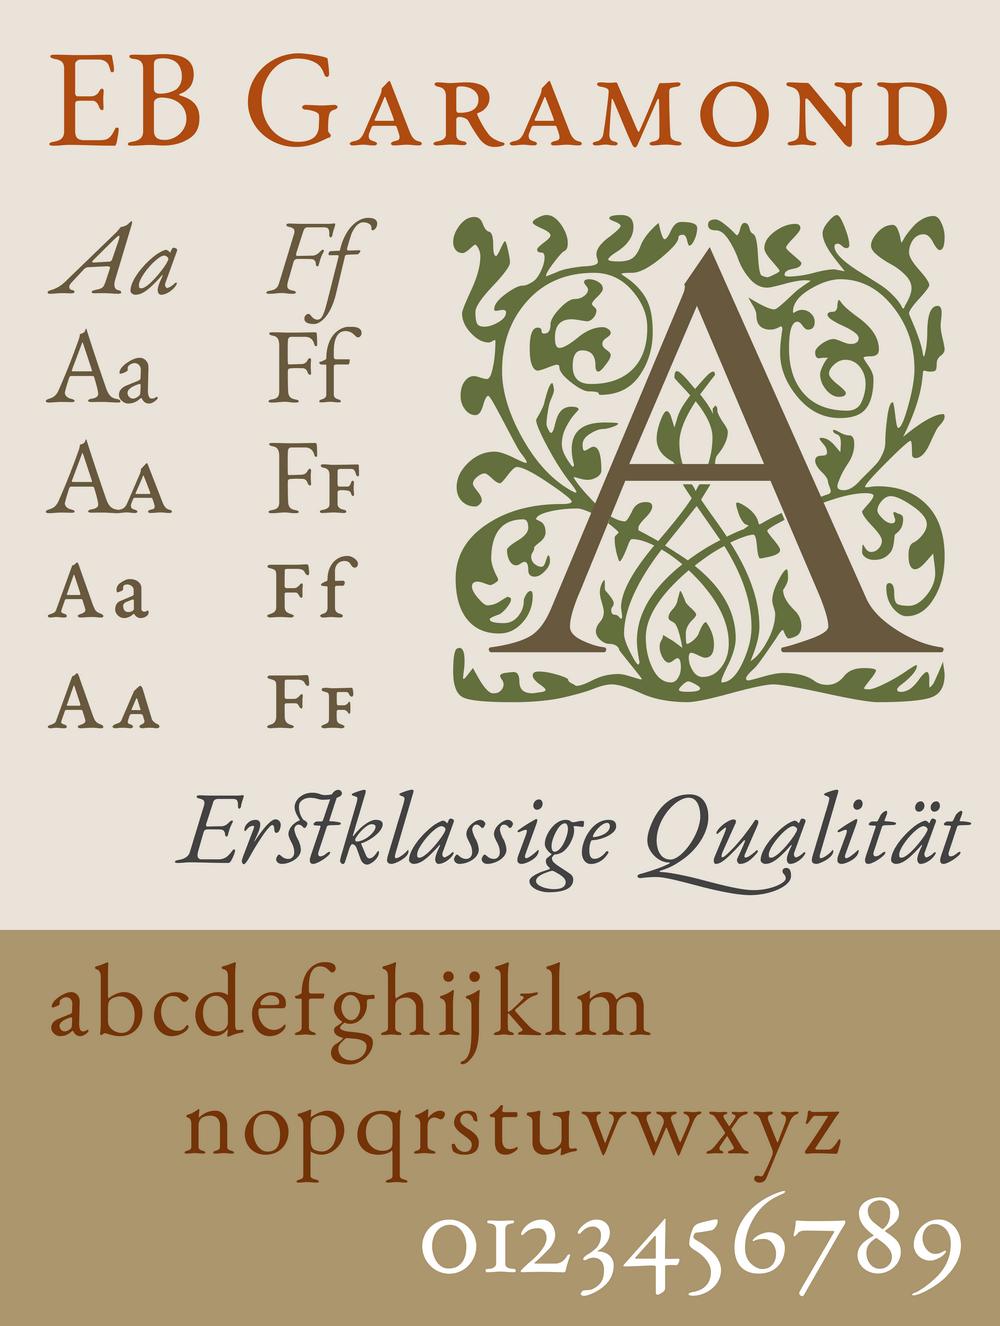 EB Garamond бесплатный шрифт от Georg Duffner